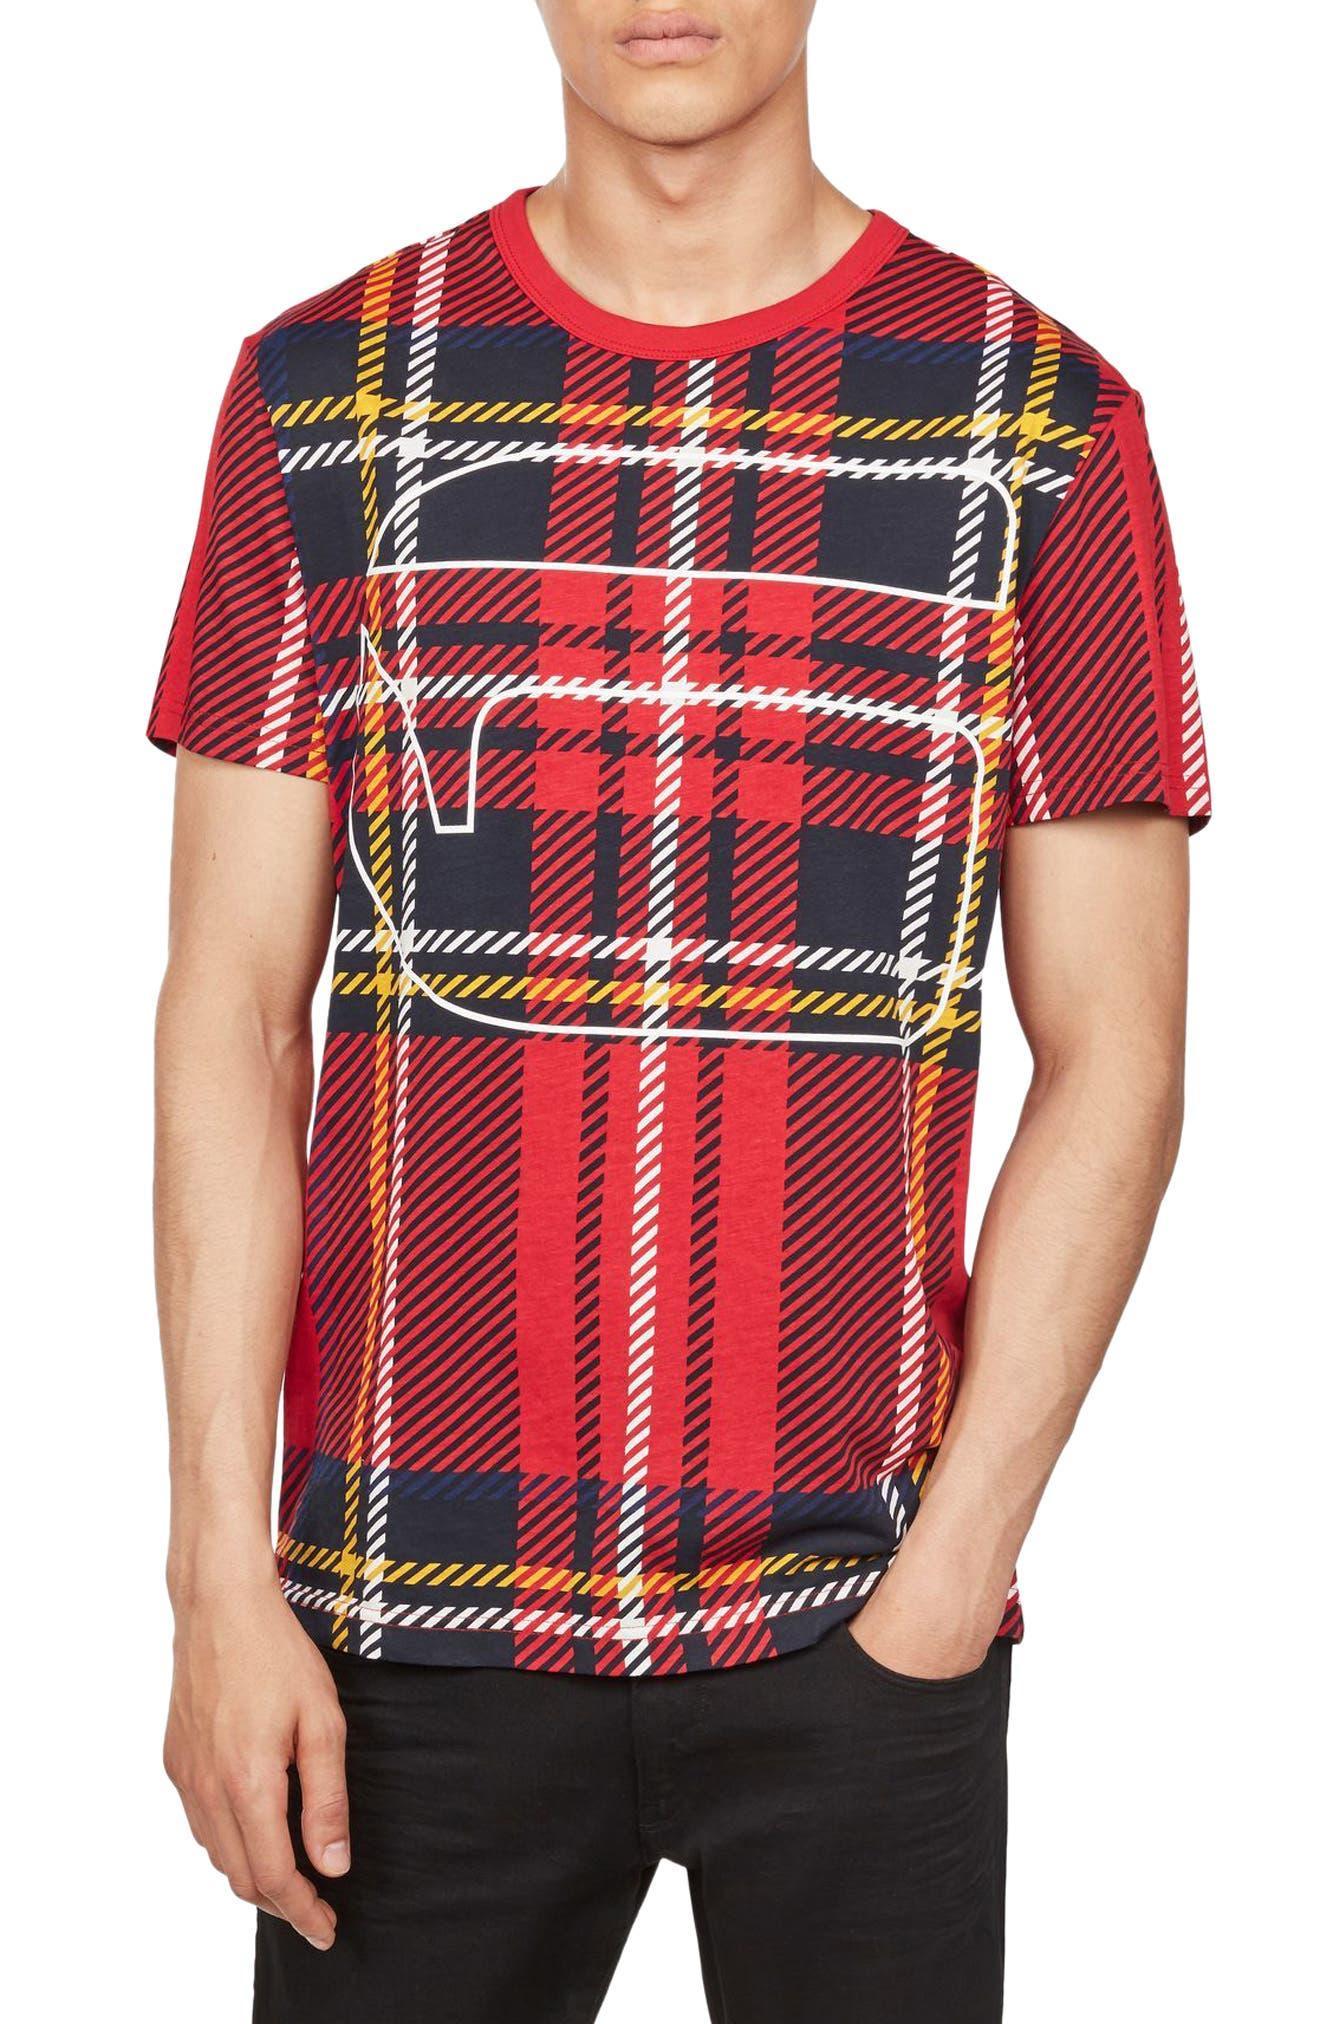 Main Image - G-Star Raw Royal Tartan Graphic T-Shirt